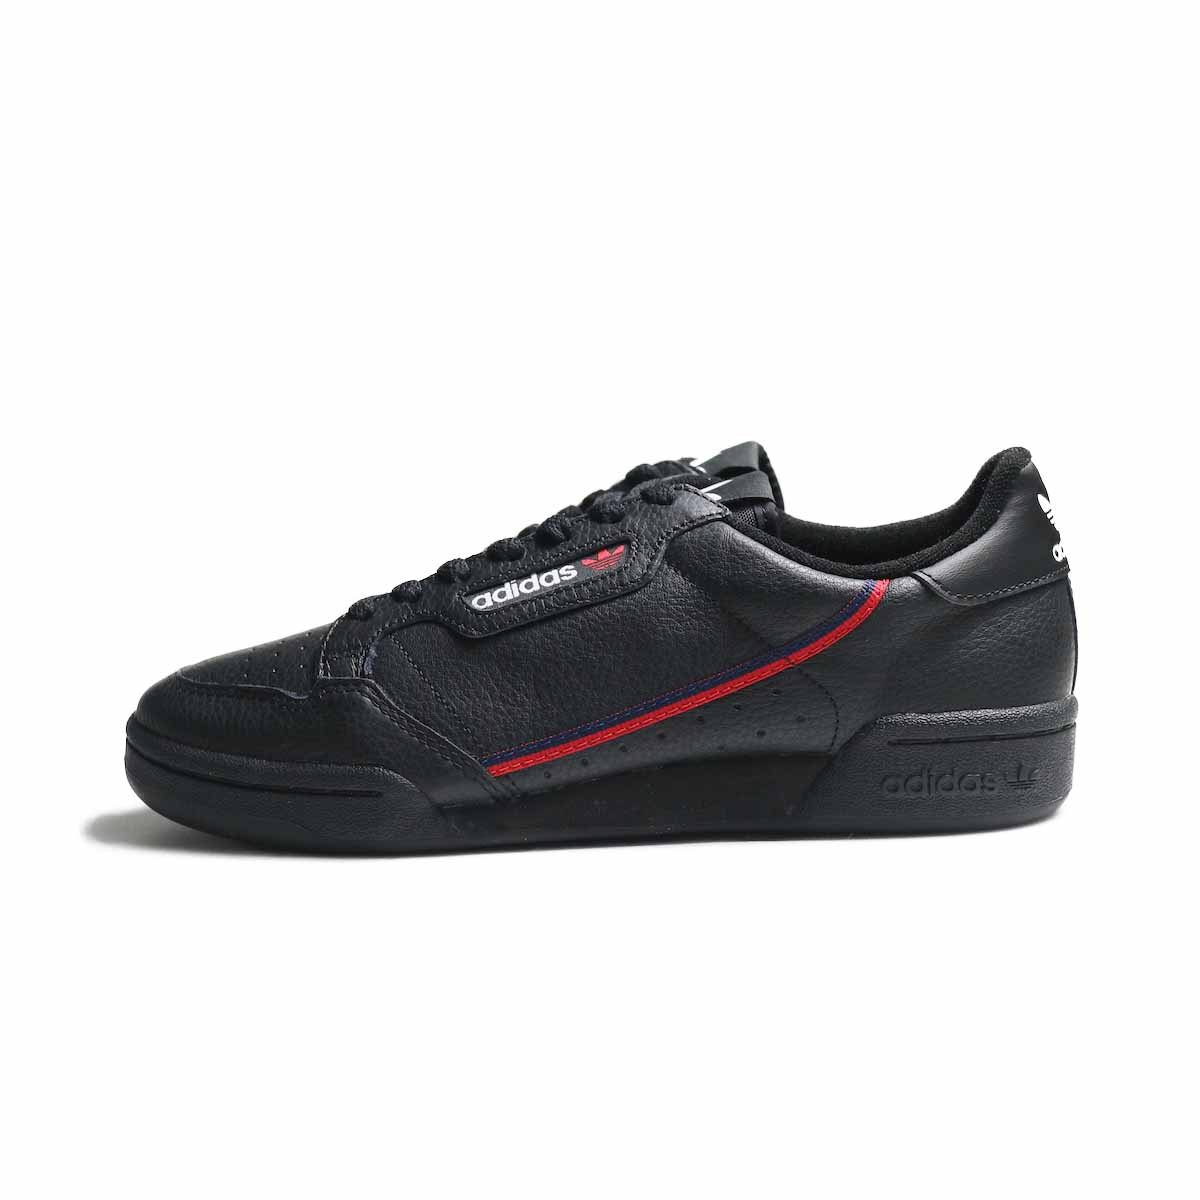 adidas originals / CONTINENTAL80 (G27707) -Black